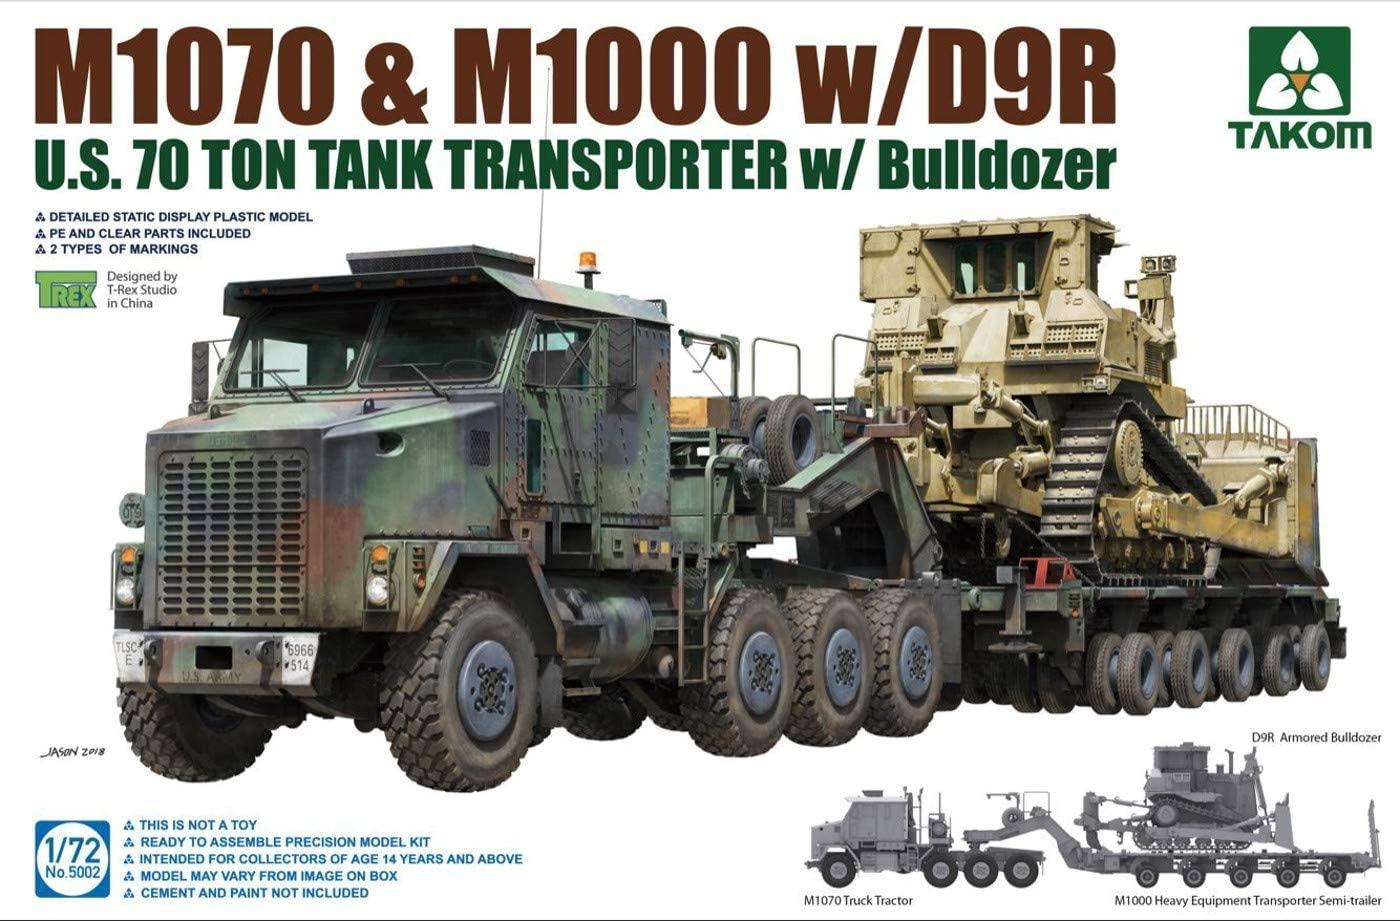 Takom 1/72 U.S. M1070&M1000 w/D9R, 70 Ton Tank Transporter w/Bulldozer